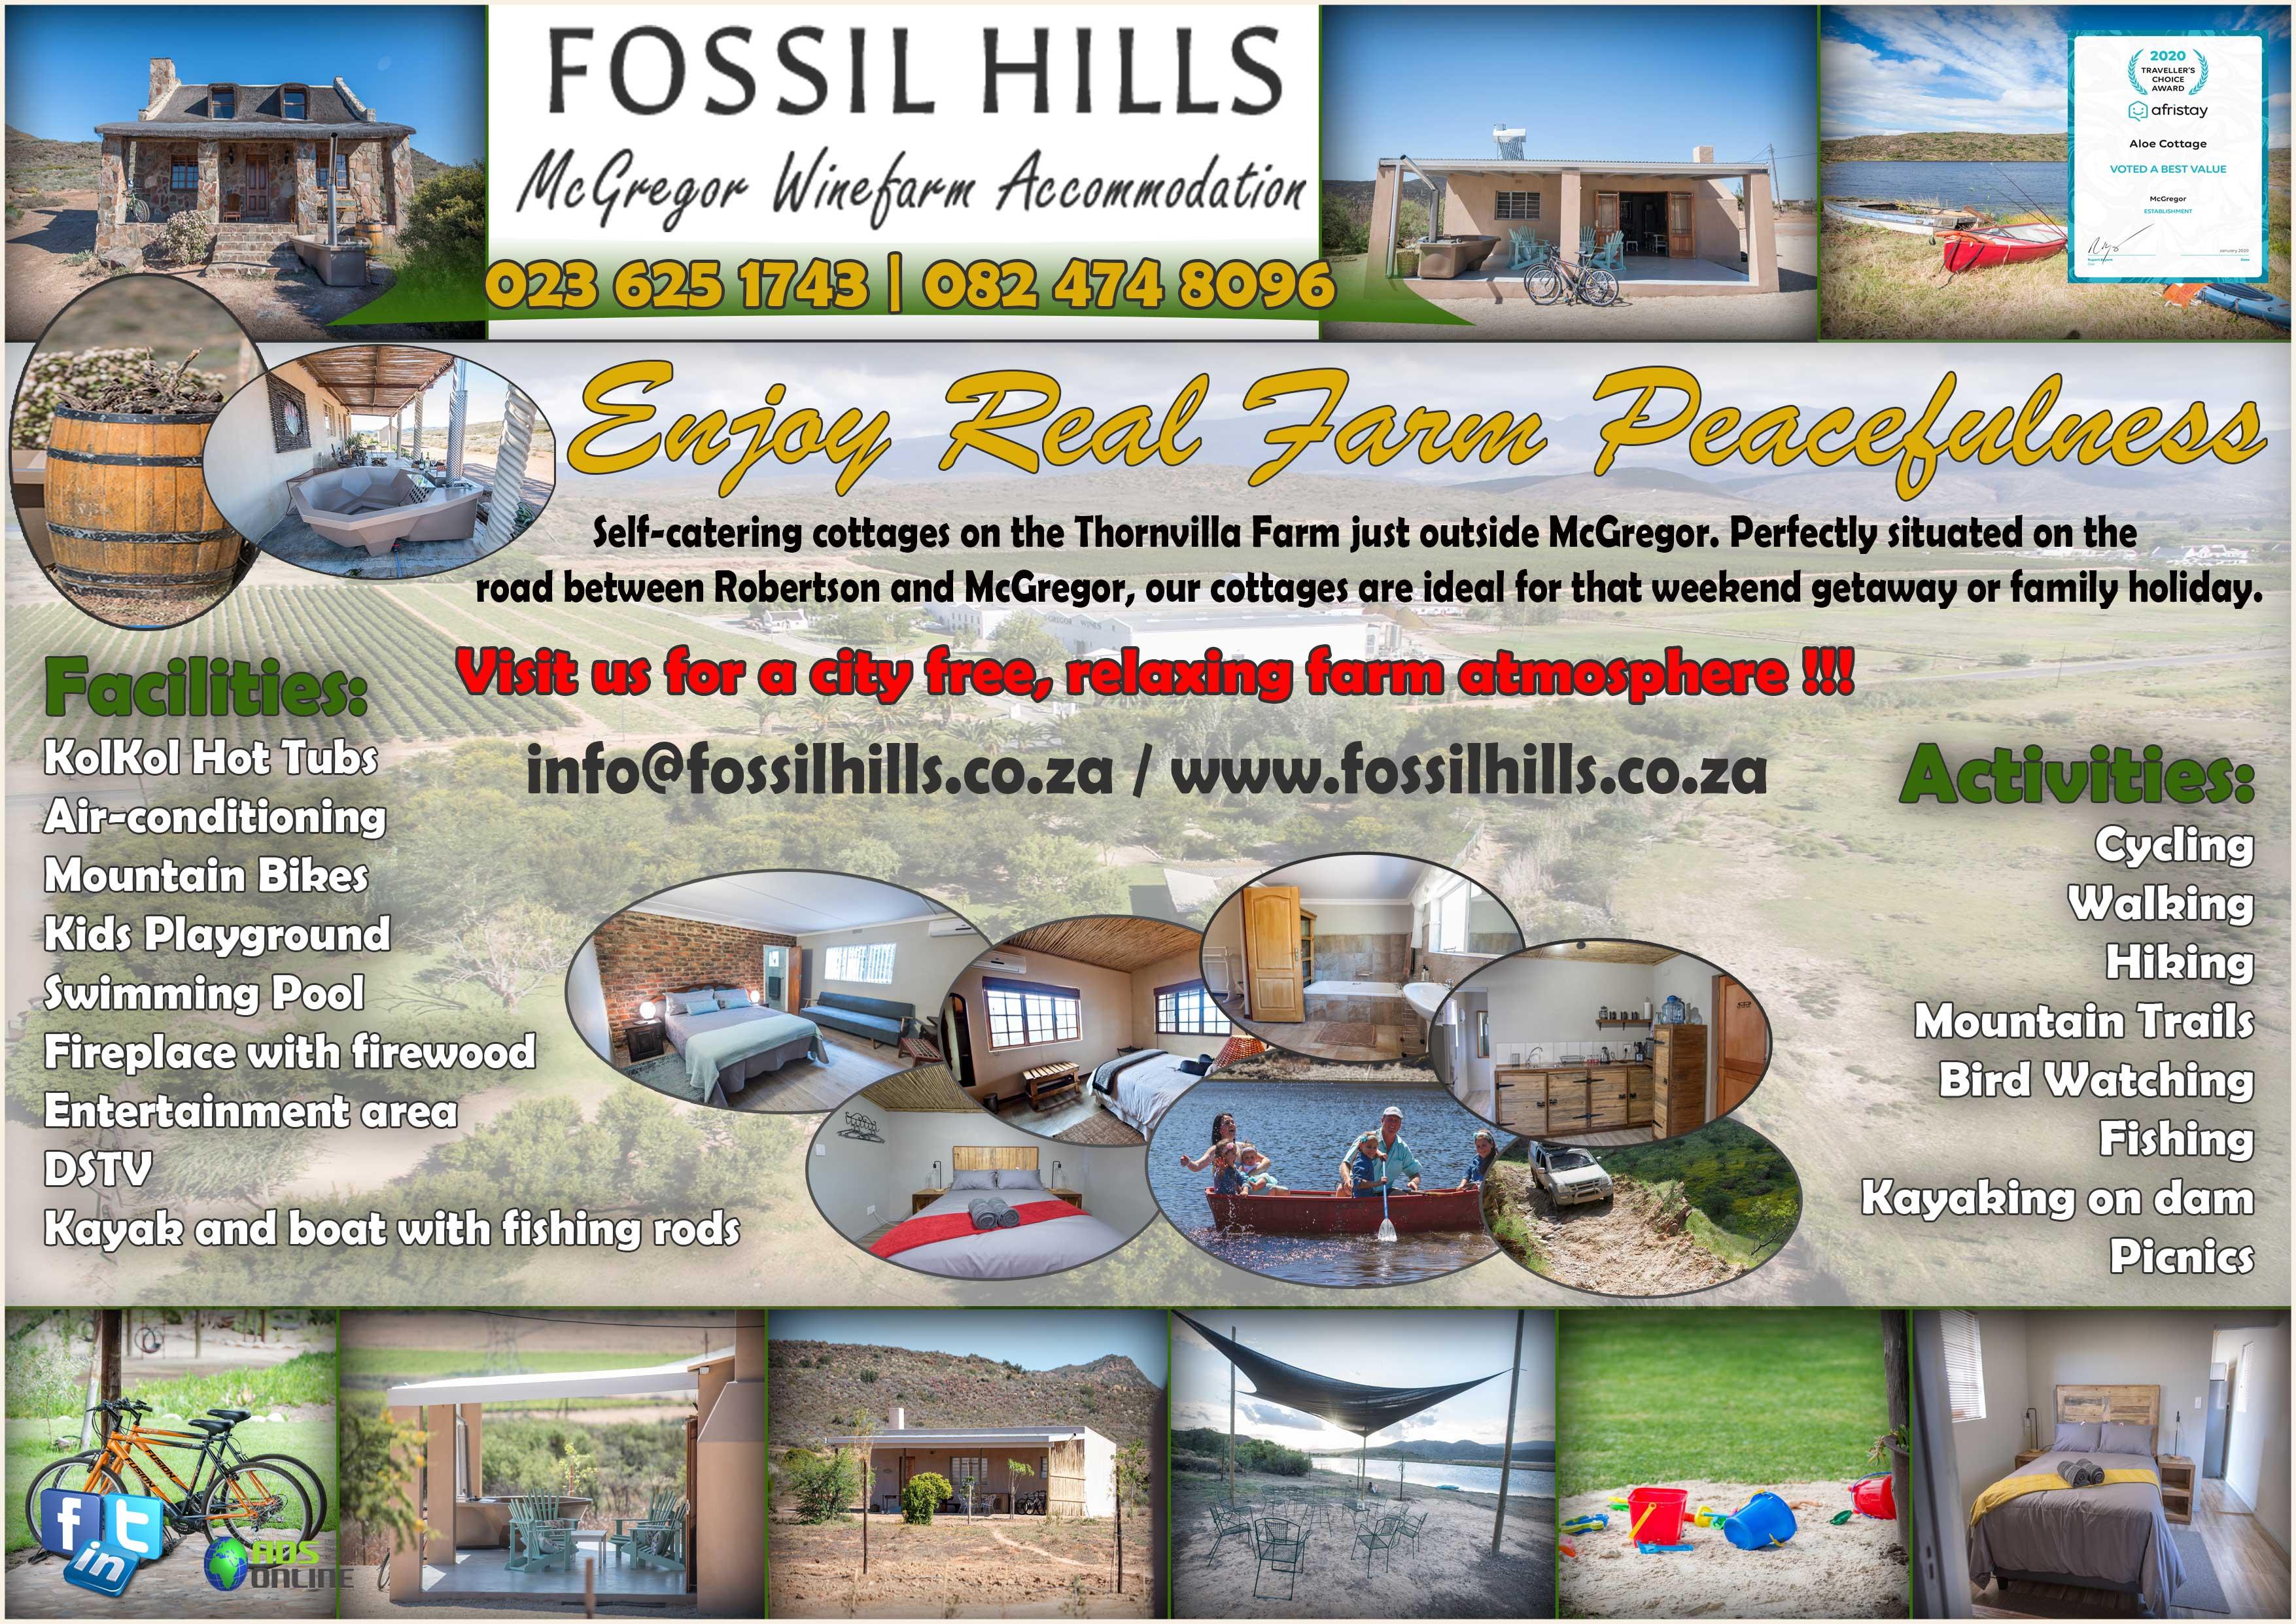 Fossil Hills – McGregor Winefarm Accommodation   Thornvilla, Western Cape